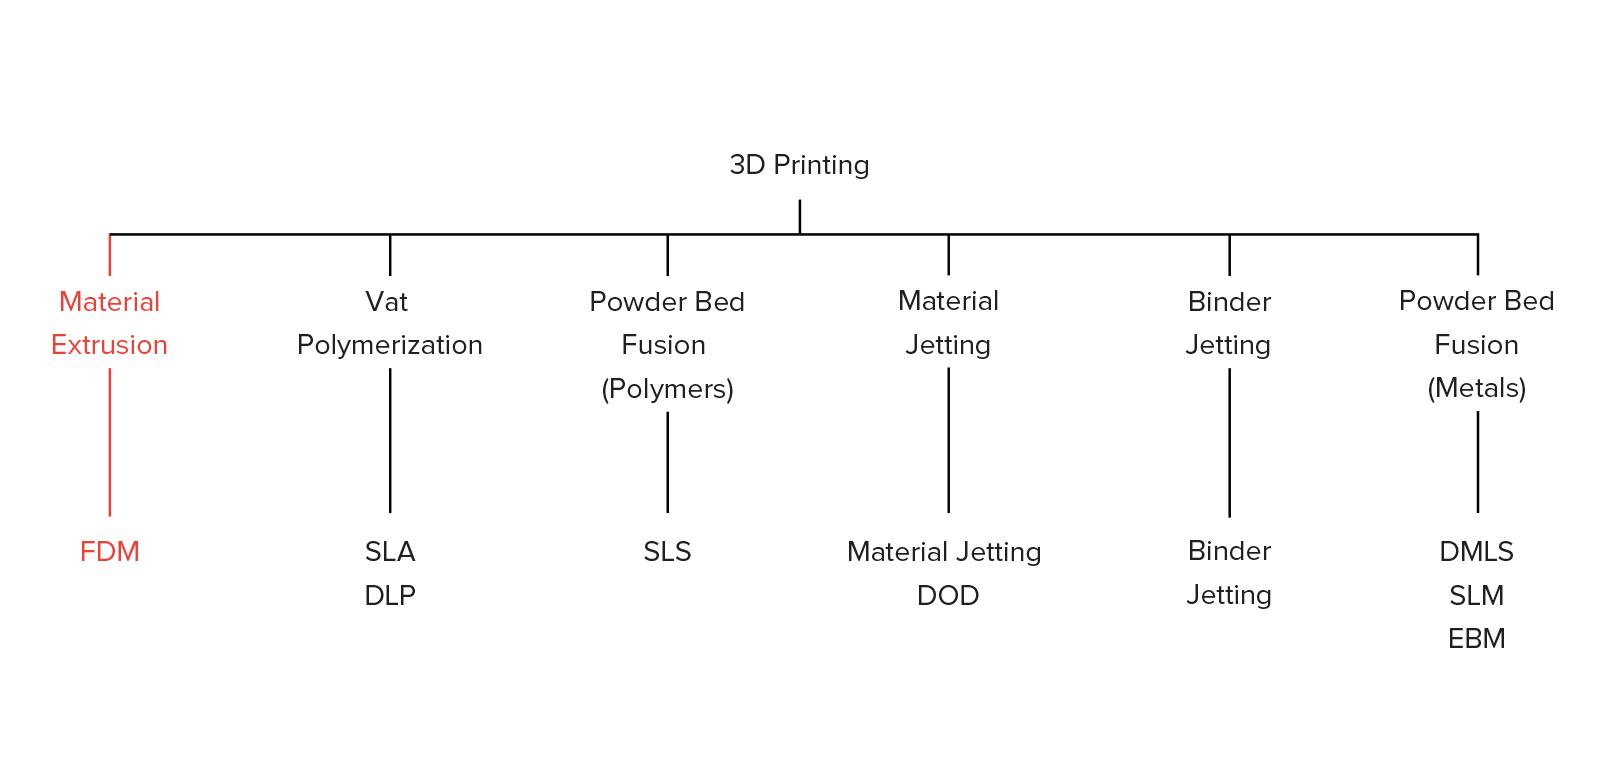 https://s3-eu-west-1.amazonaws.com/3dhubs-knowledgebase/intro-fdm-3d-printing/1-fdm-tree.png